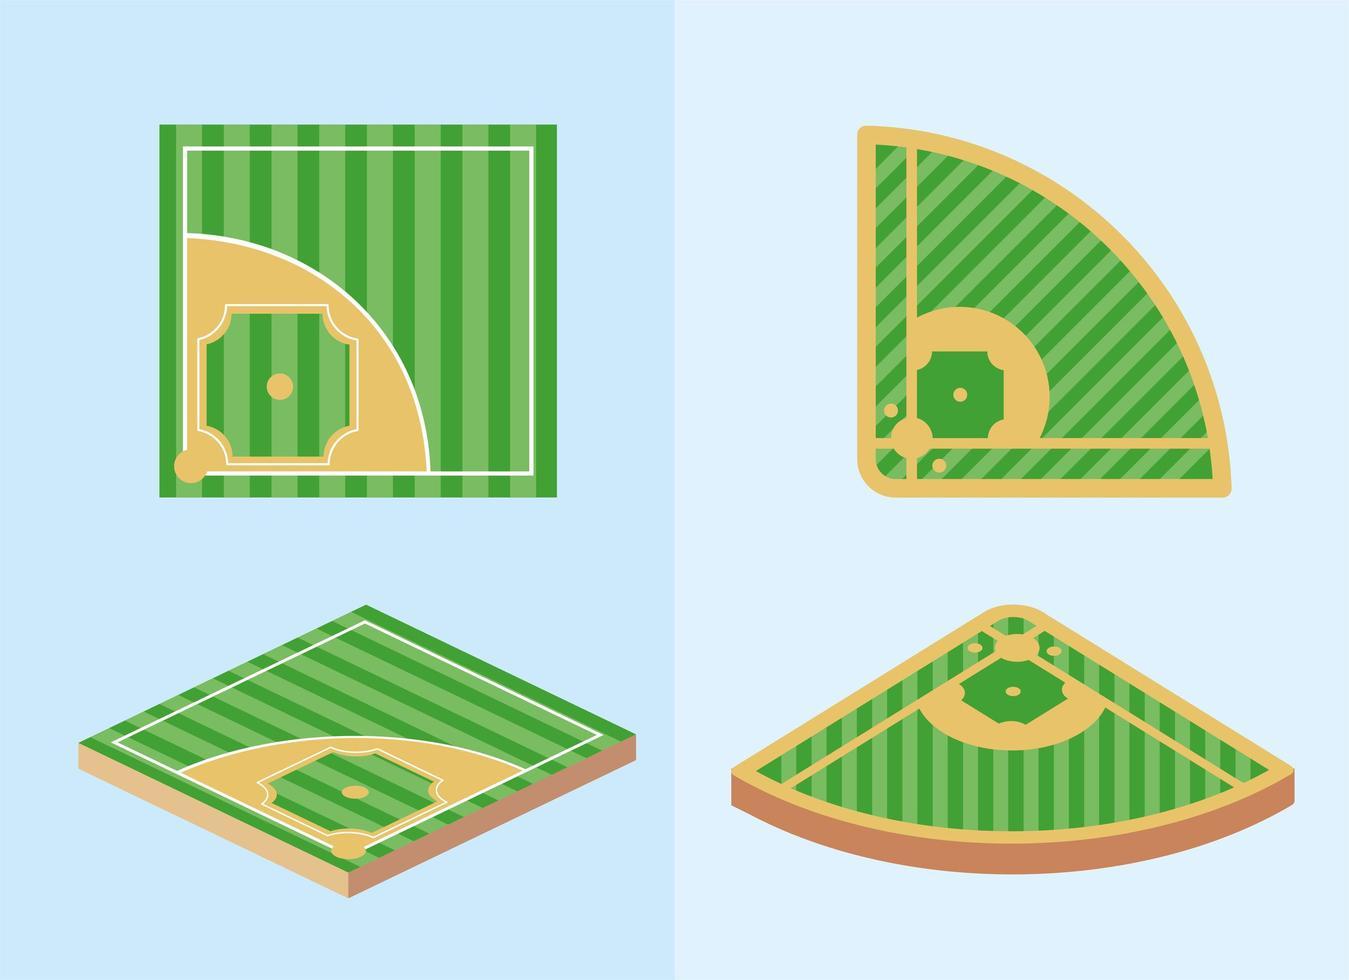 set honkbalvelden vector